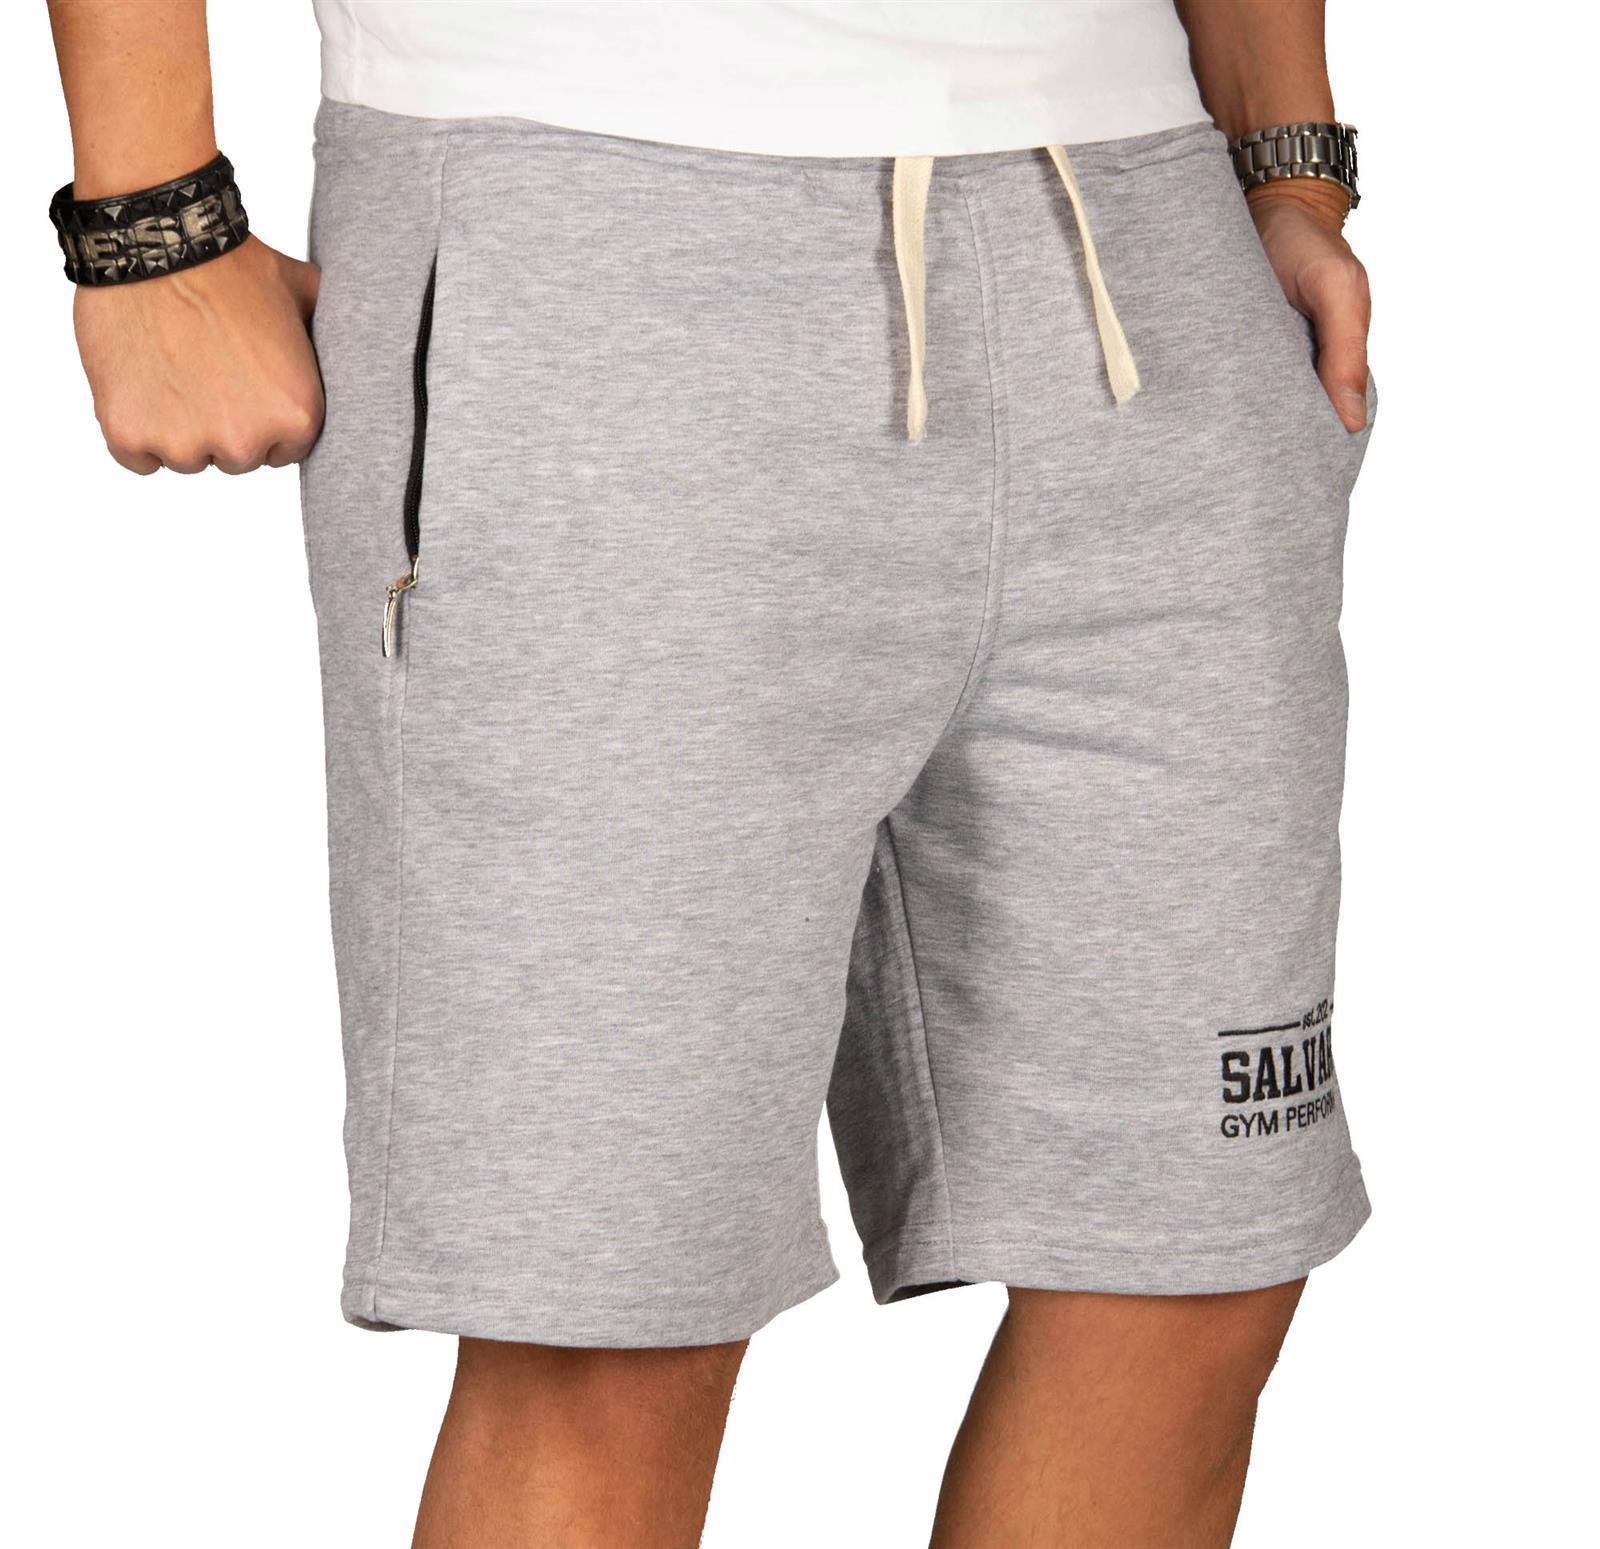 A-Salvarini-Herren-Sport-Jogging-Short-Fitness-Kurze-Hose-Trainingshose-AS130 Indexbild 18